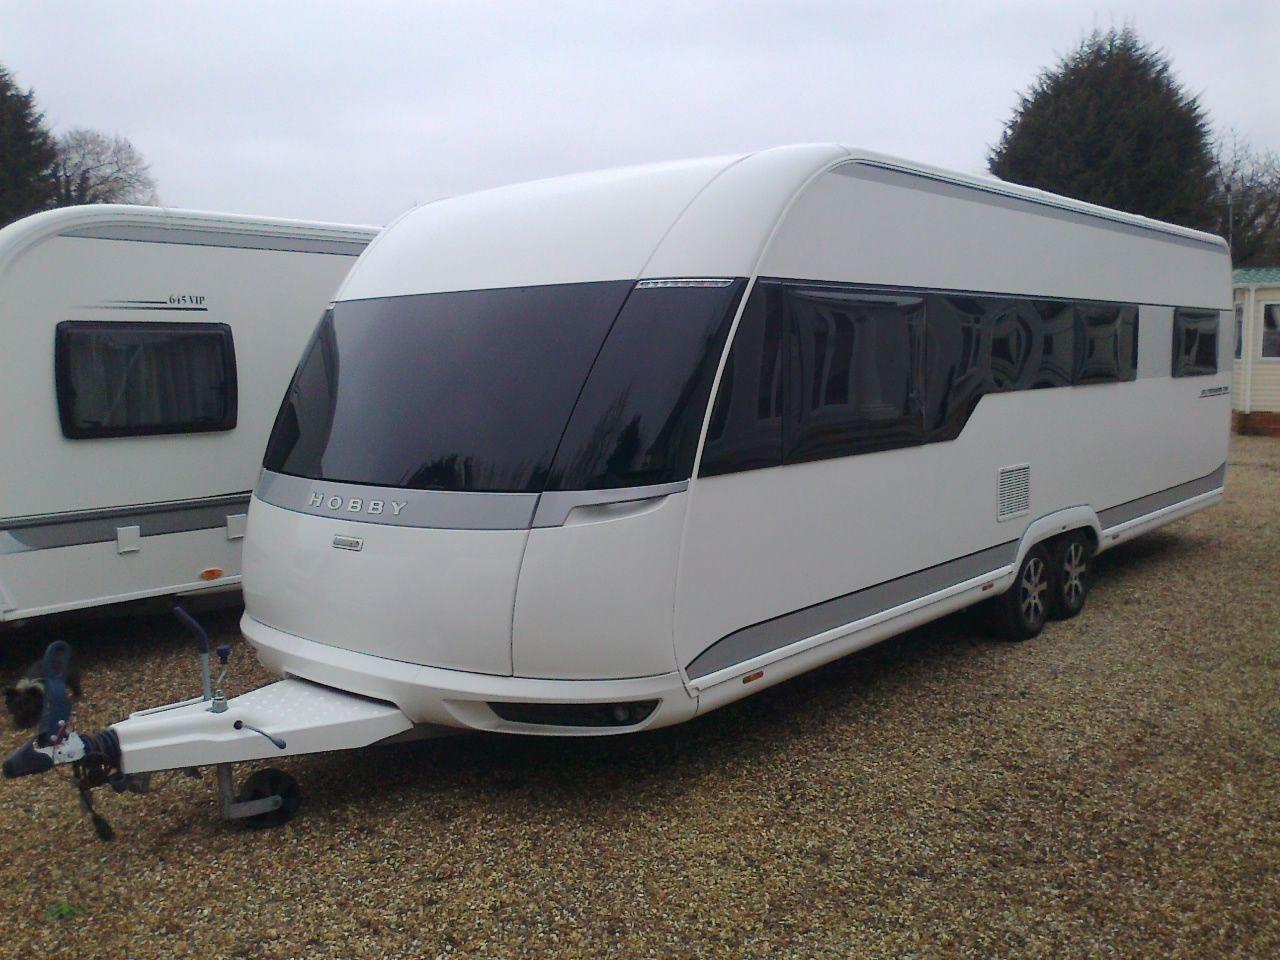 Hobby Caravan 700 Premium Like Tabbert And Fendt (2013) One Owner, Immaculate | eBay